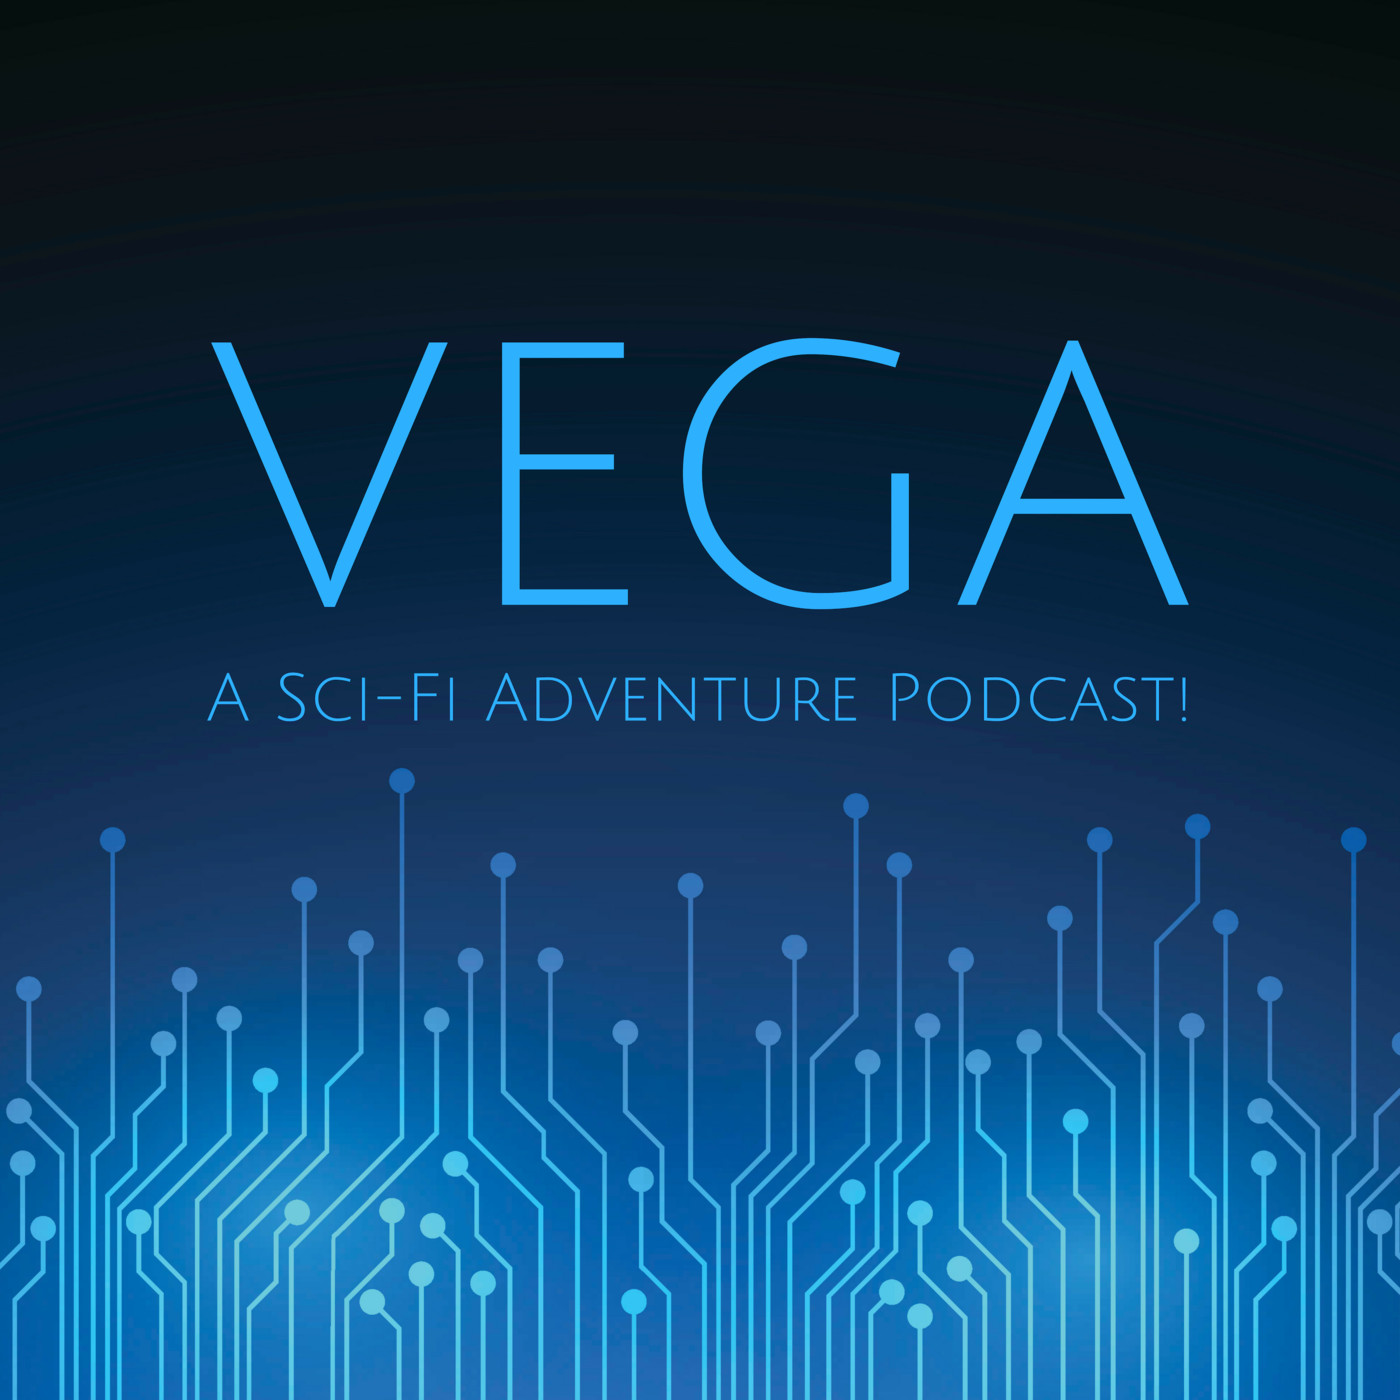 """Vega: A Sci-Fi Adventure Podcast!"" Podcast"